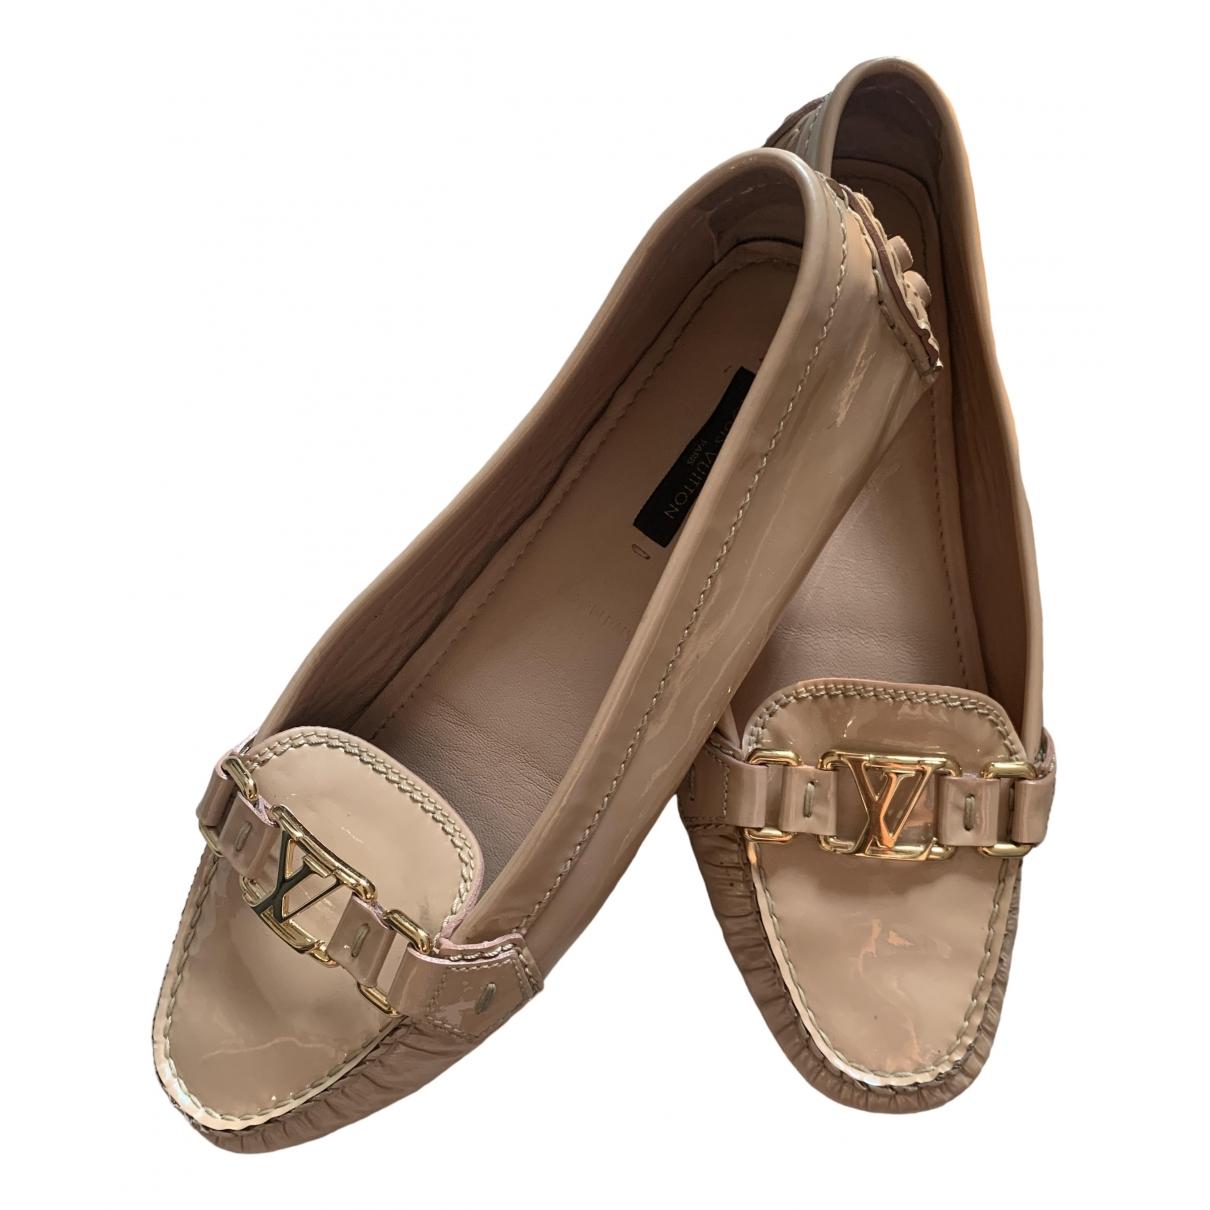 Louis Vuitton \N Espadrilles in  Beige Leder